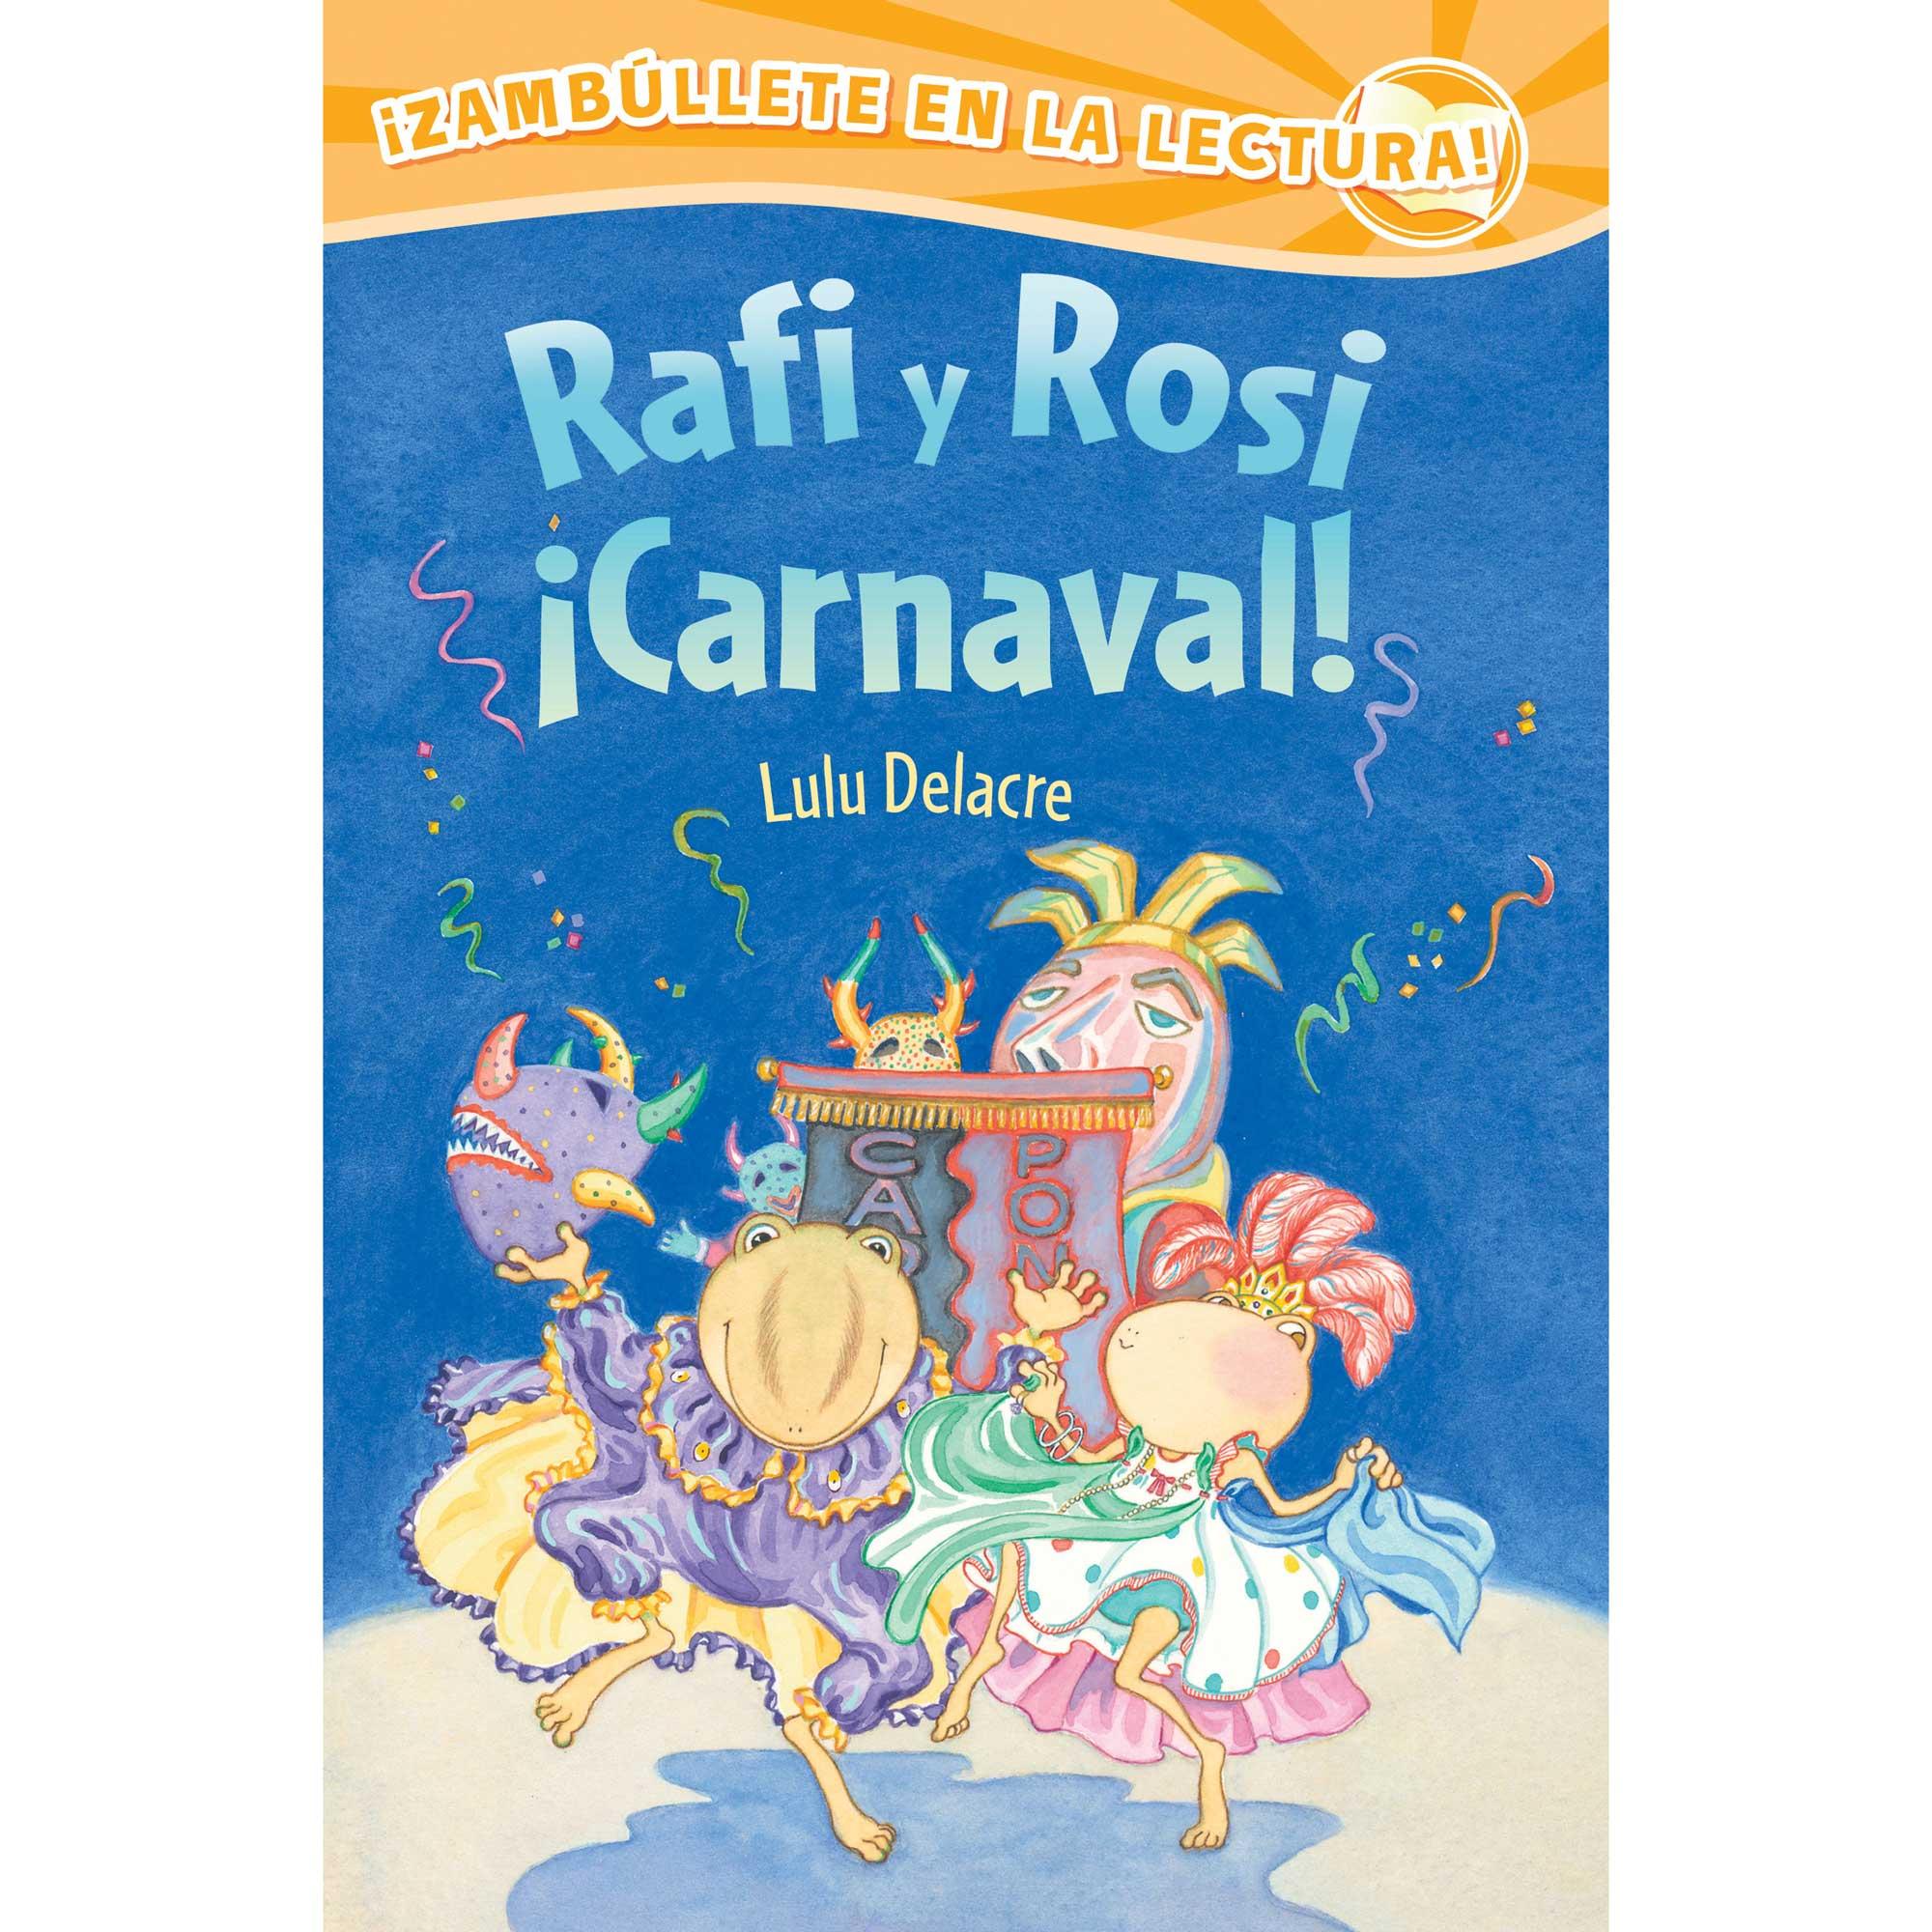 Rafi y Rosi Carnival by Lulu Delacre